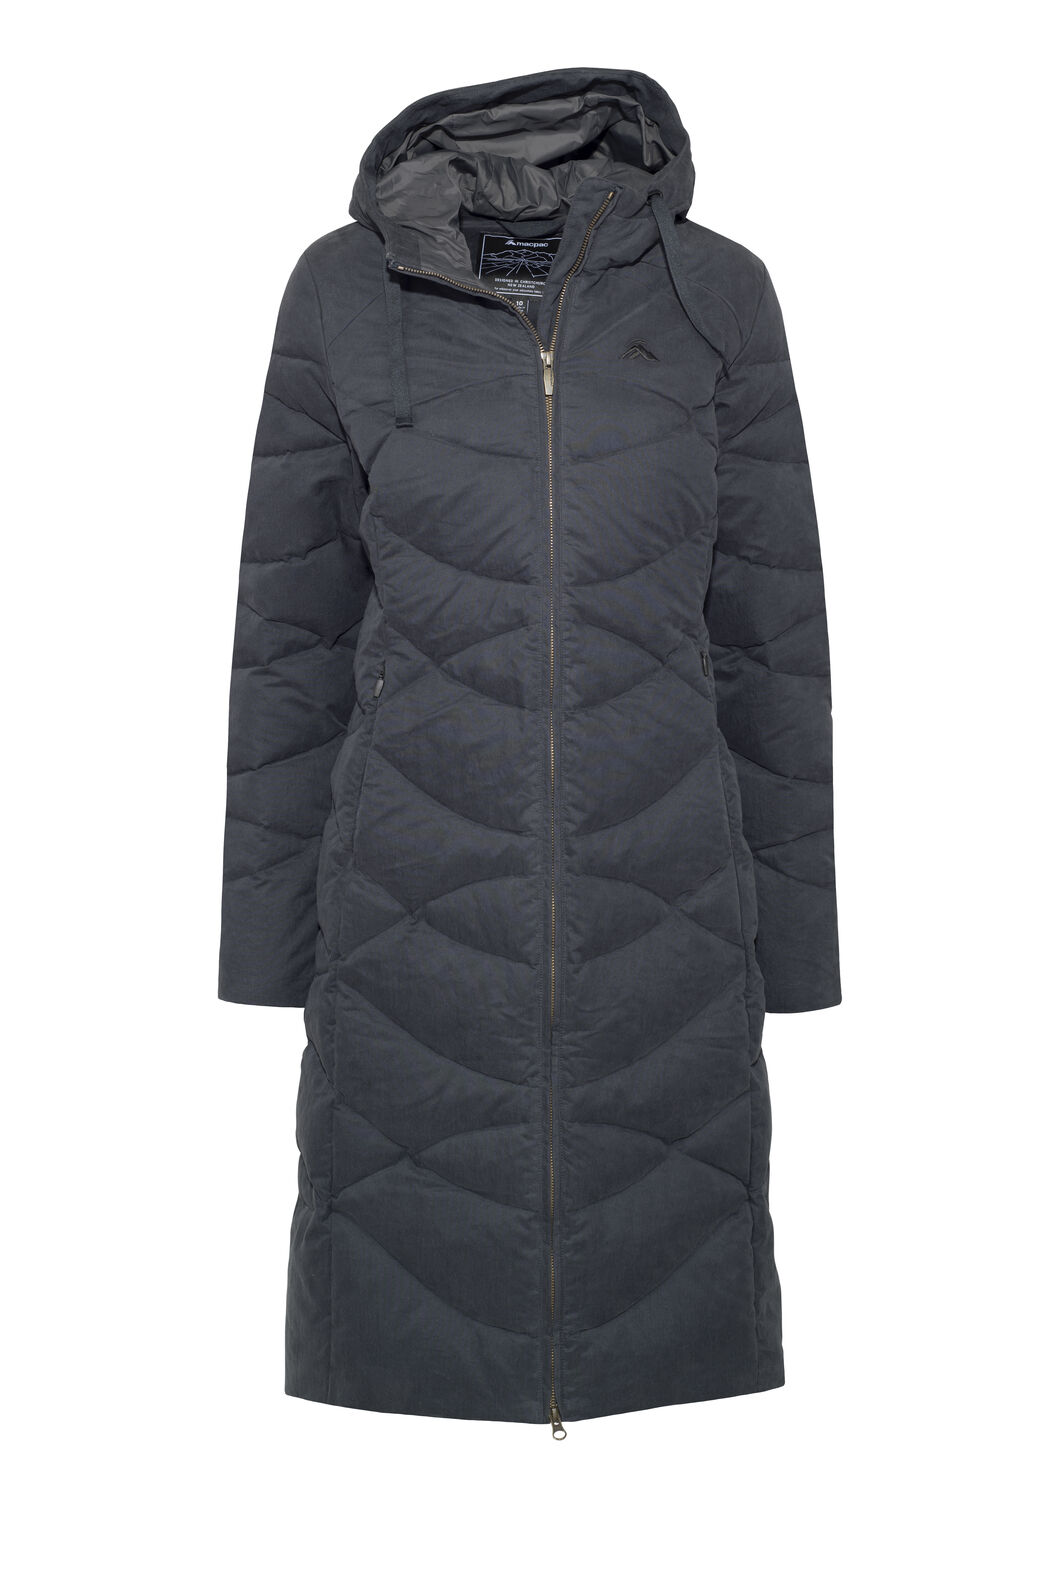 Macpac Twilight Down Coat — Women's, Carbon, hi-res